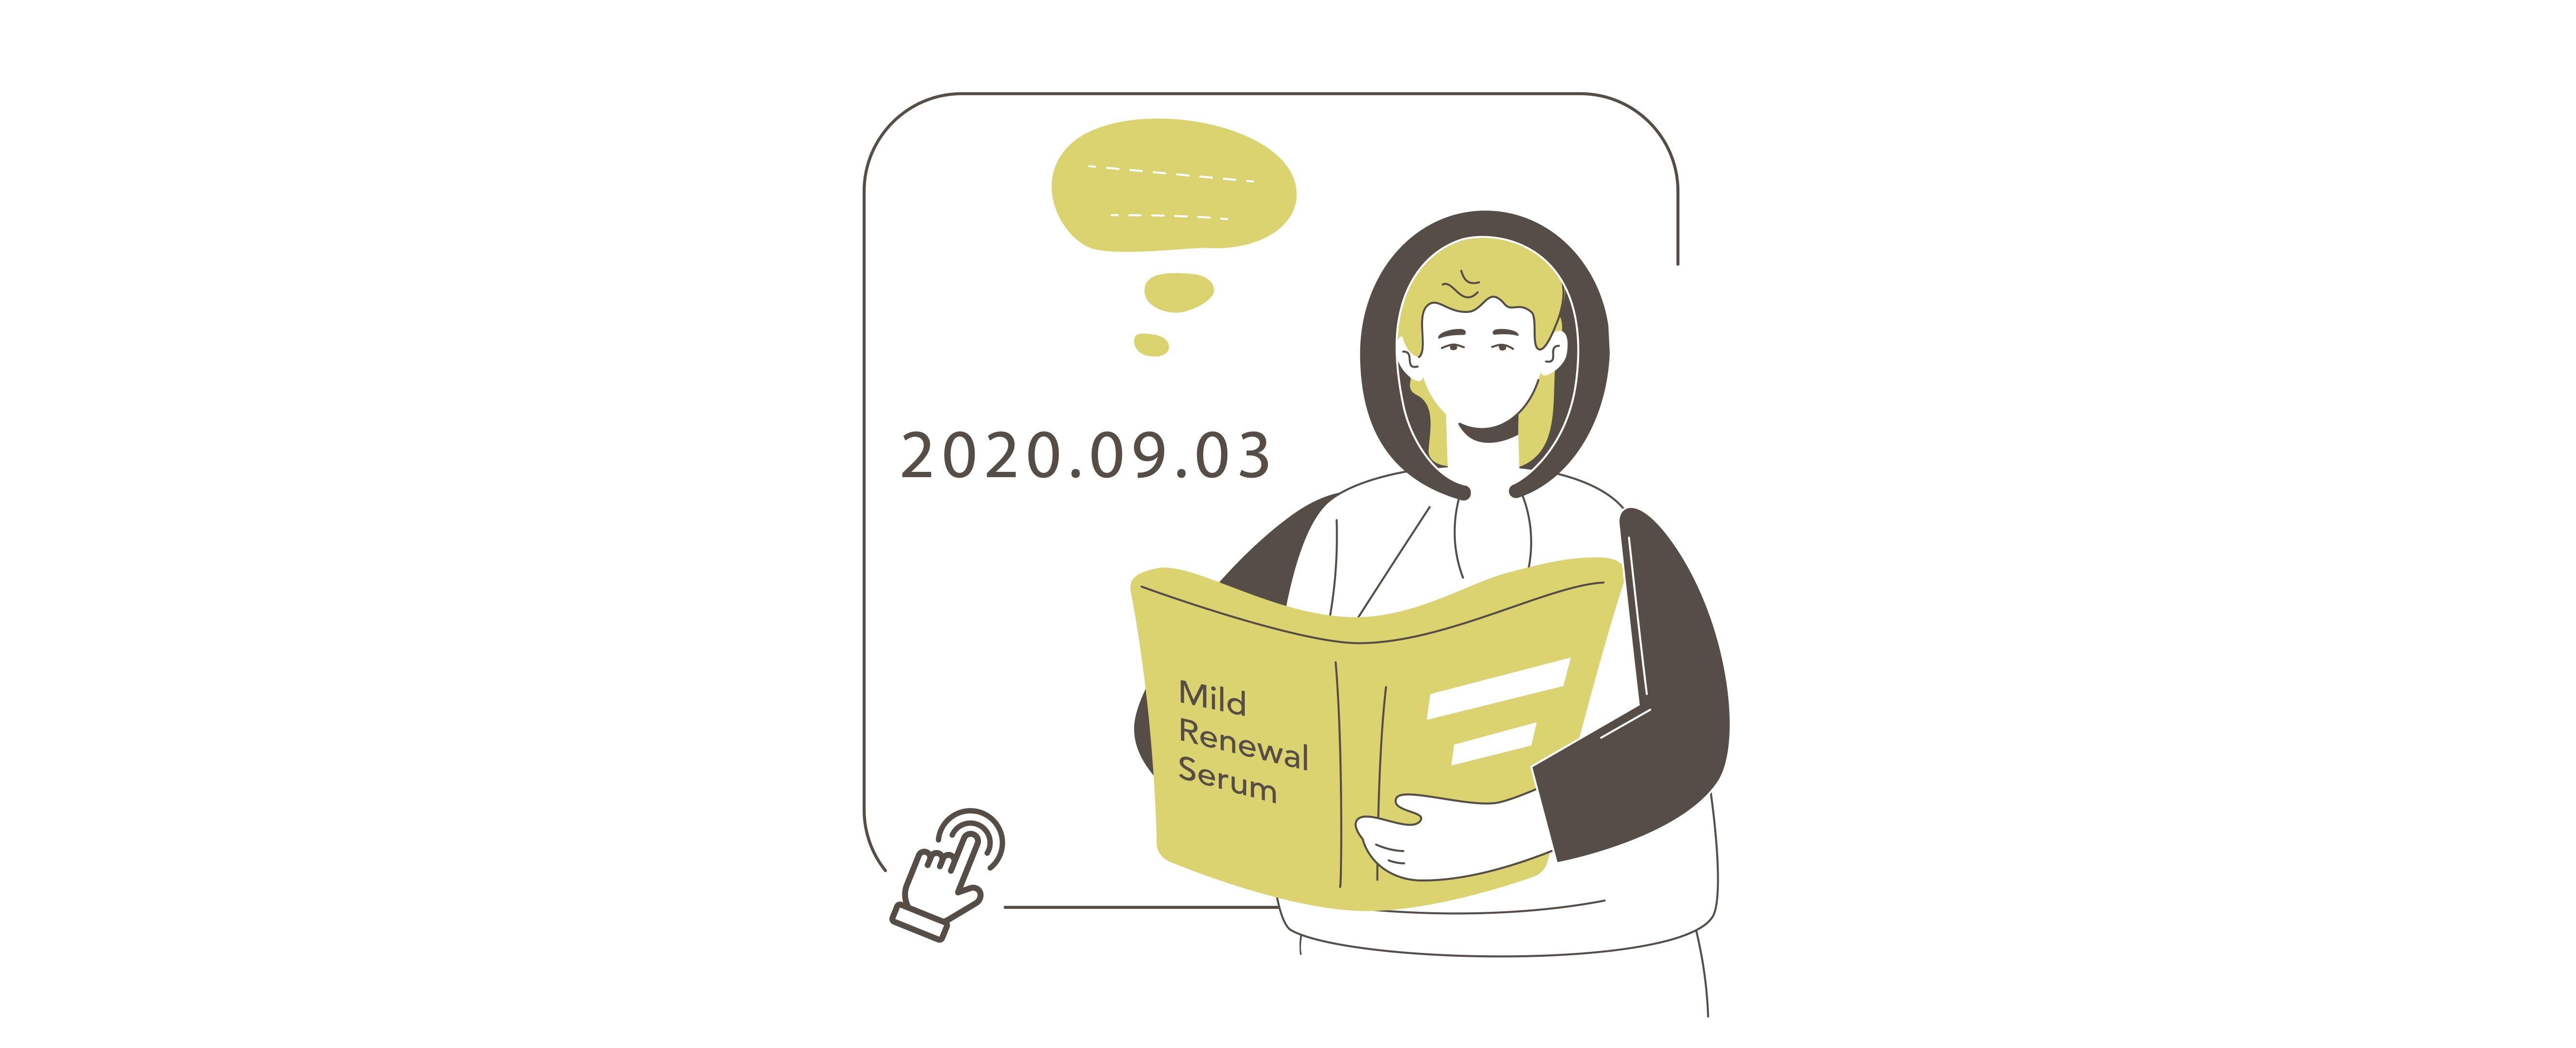 "<img src=""product-profile-mrs-20200903.jpeg"" alt=""product-profile-mrs-20200903"">"